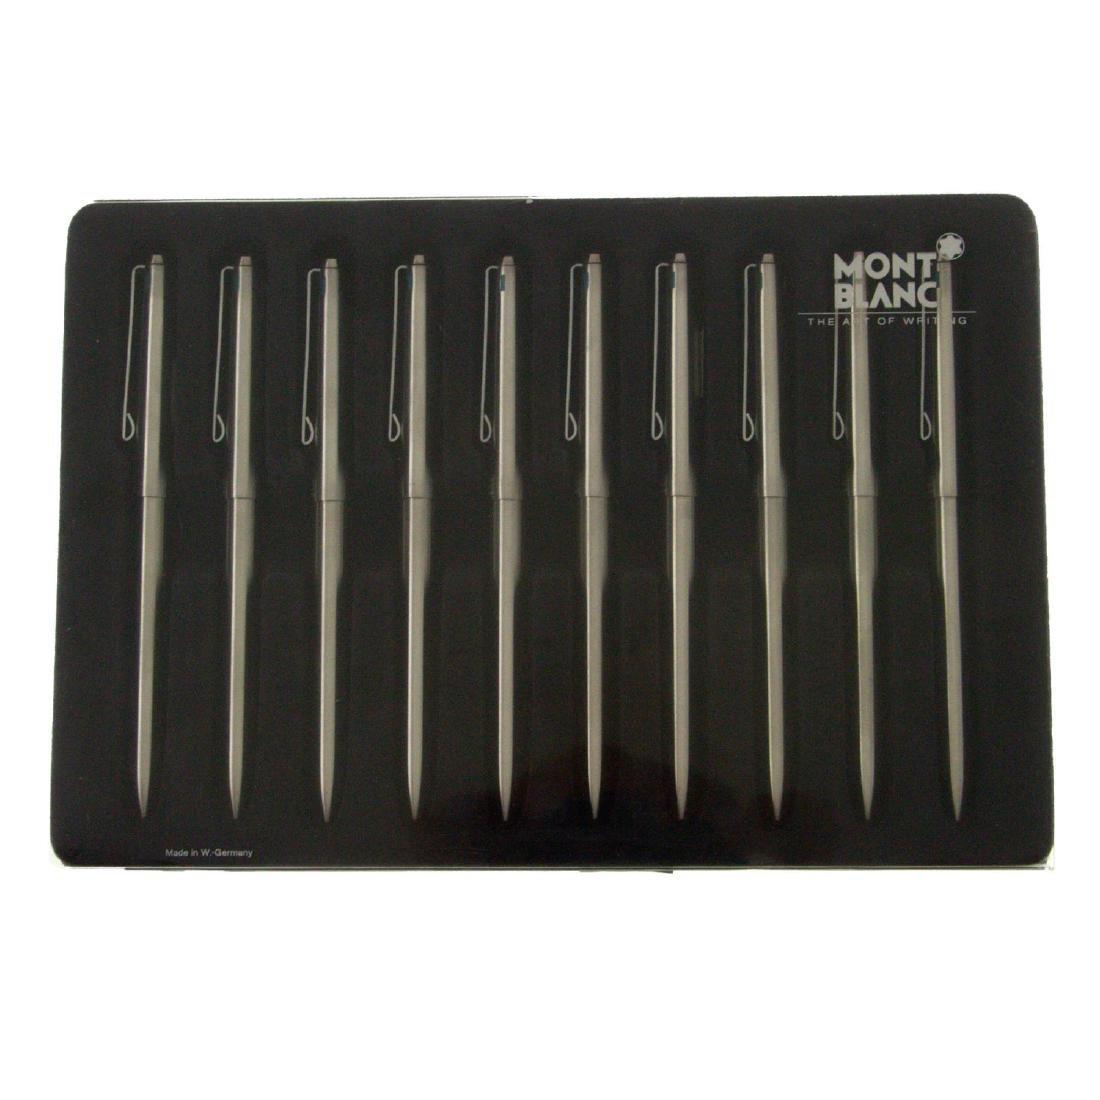 Set of 10 Montblanc Four Color Gyro Ballpoint Pens. - 2